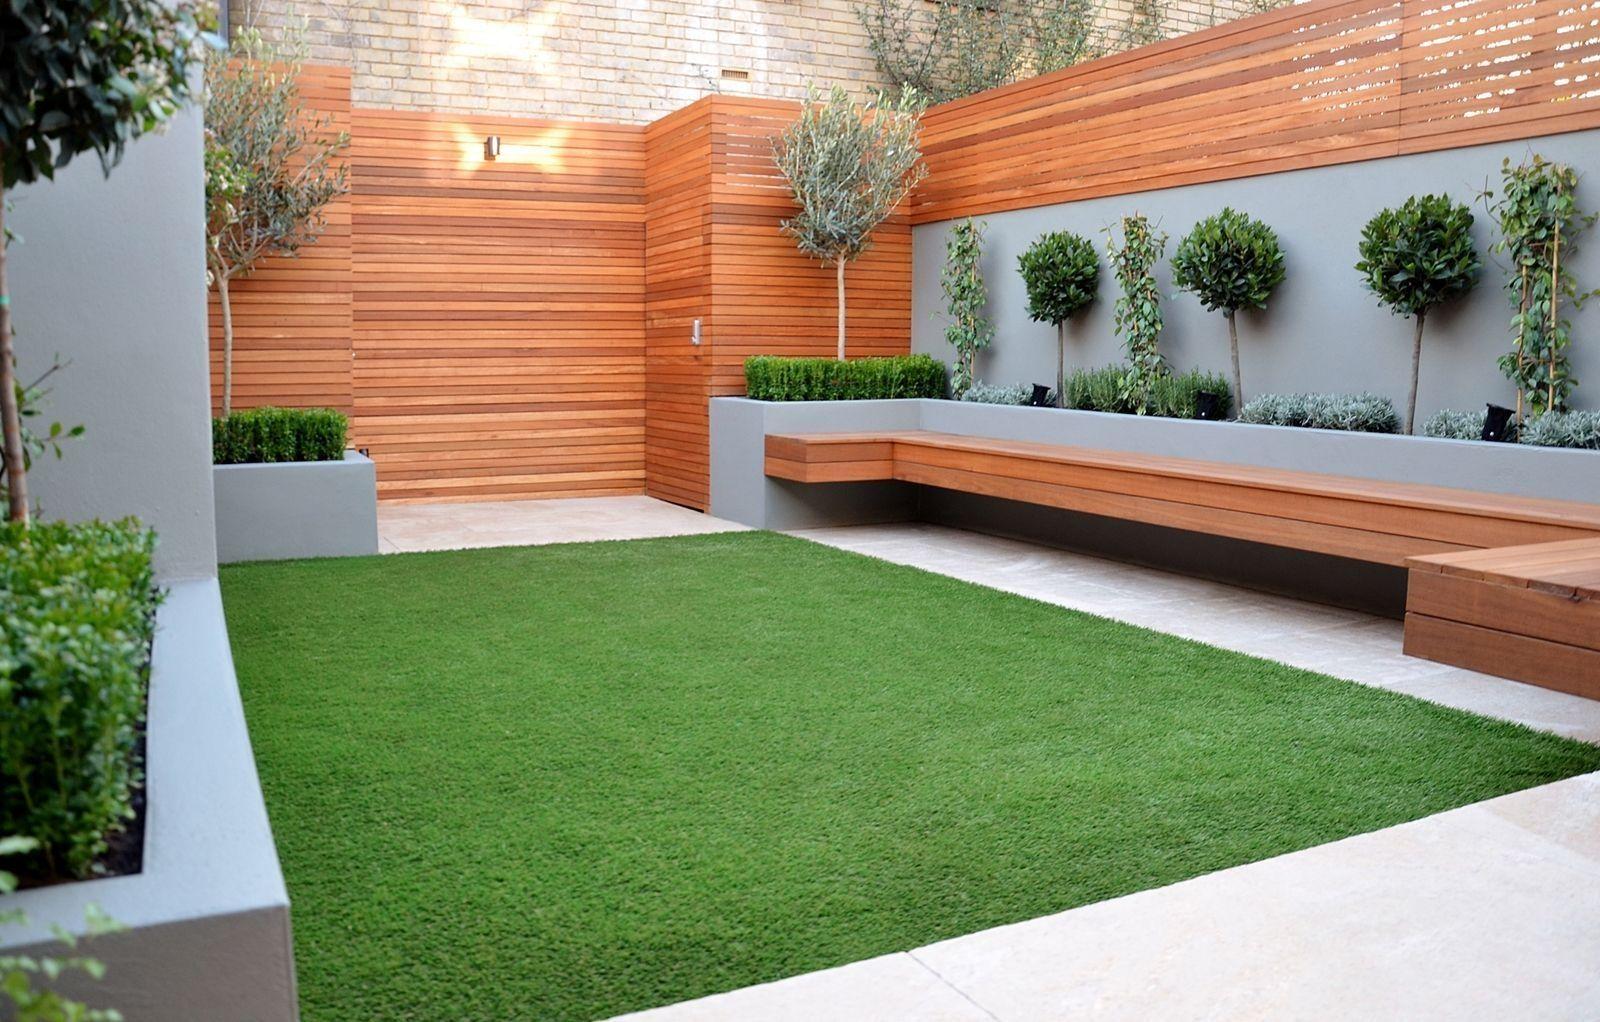 Staggering Backyard Ideas With Artificial Grass - yentua ...